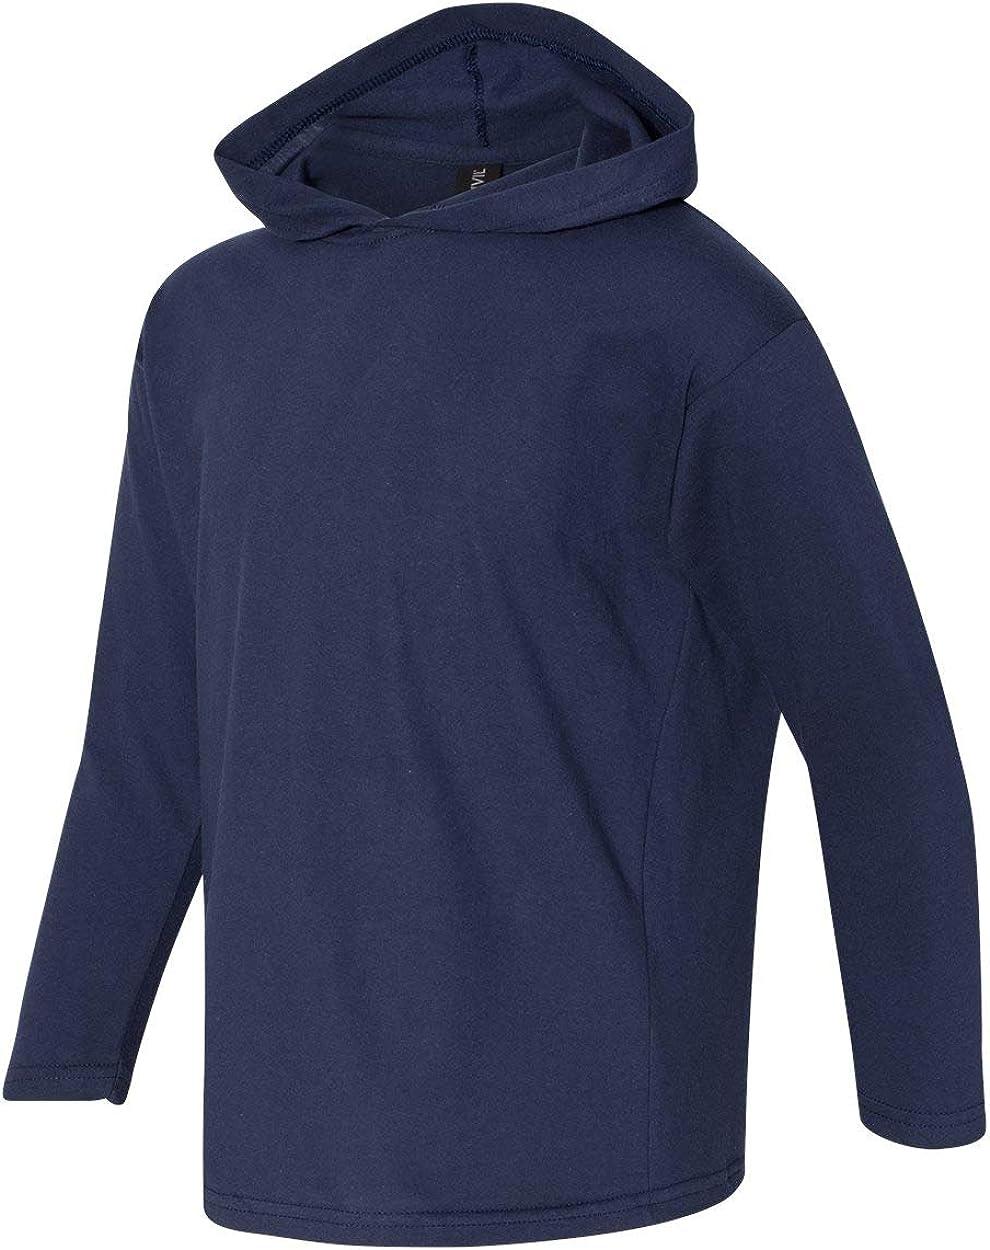 987B Anvil Youth Long-Sleeve Hooded/T-Shirt